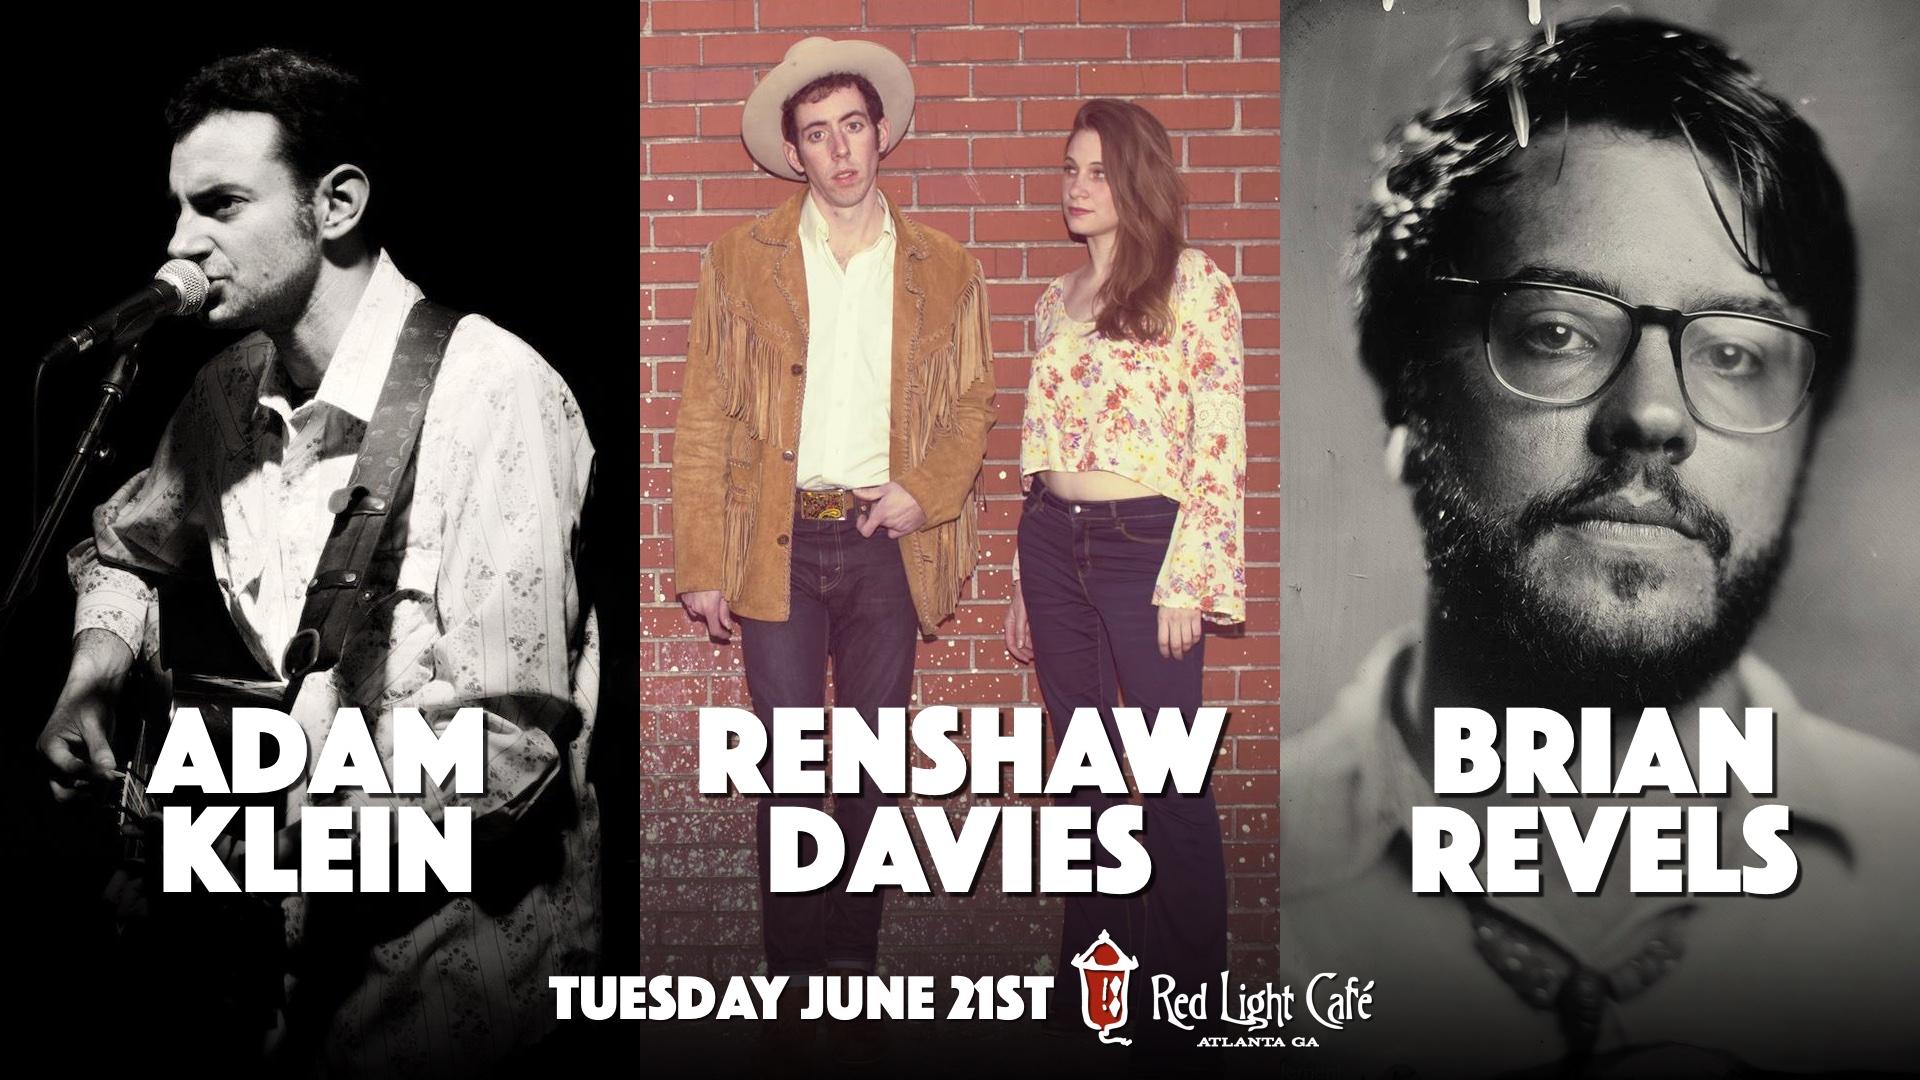 Adam Klein + Renshaw Davies + Brian Revels — June 21, 2016 — Red Light Café, Atlanta, GA